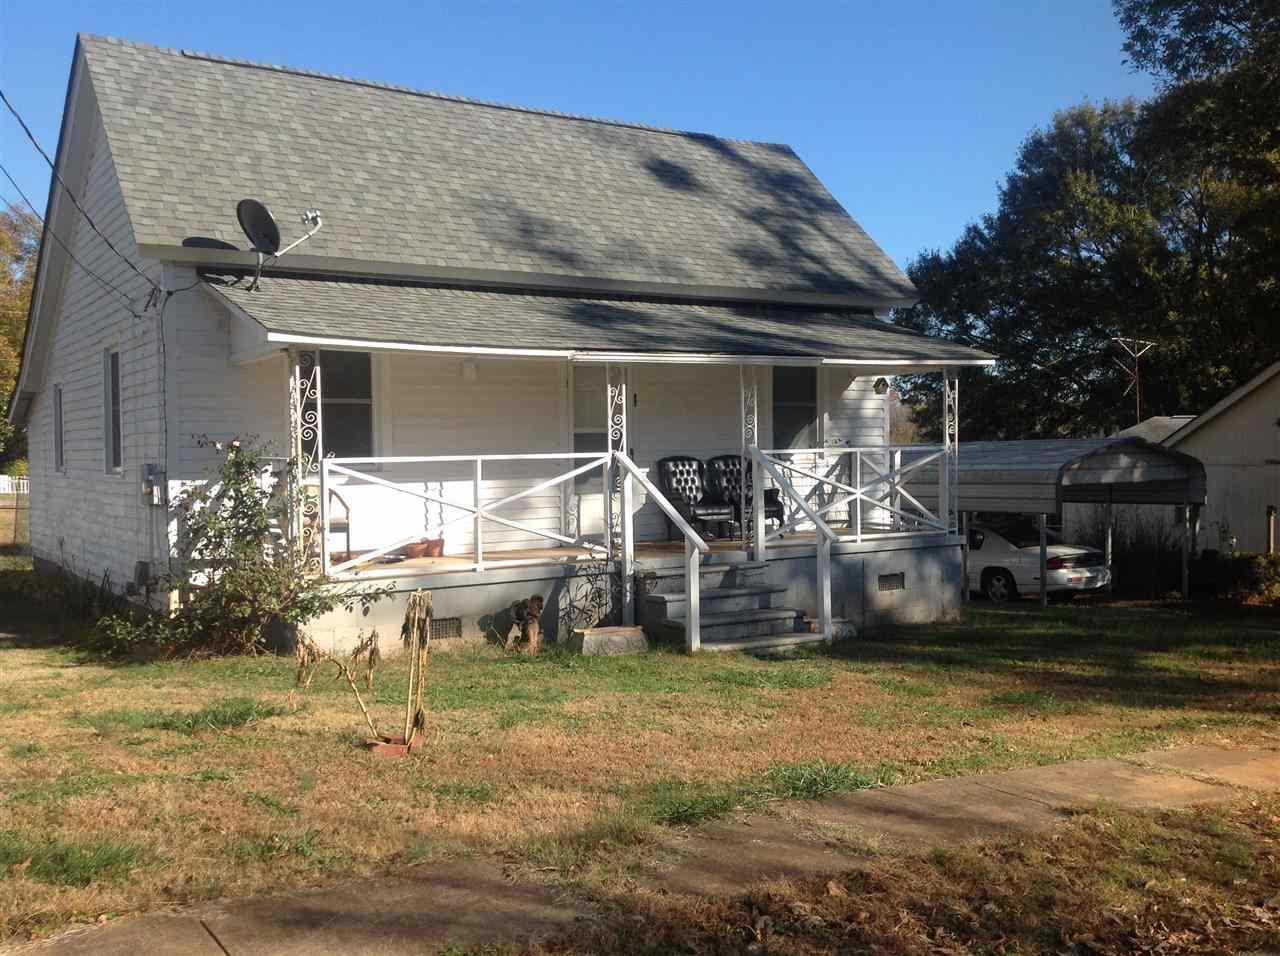 109 Hampton St, Pelzer, SC 29669